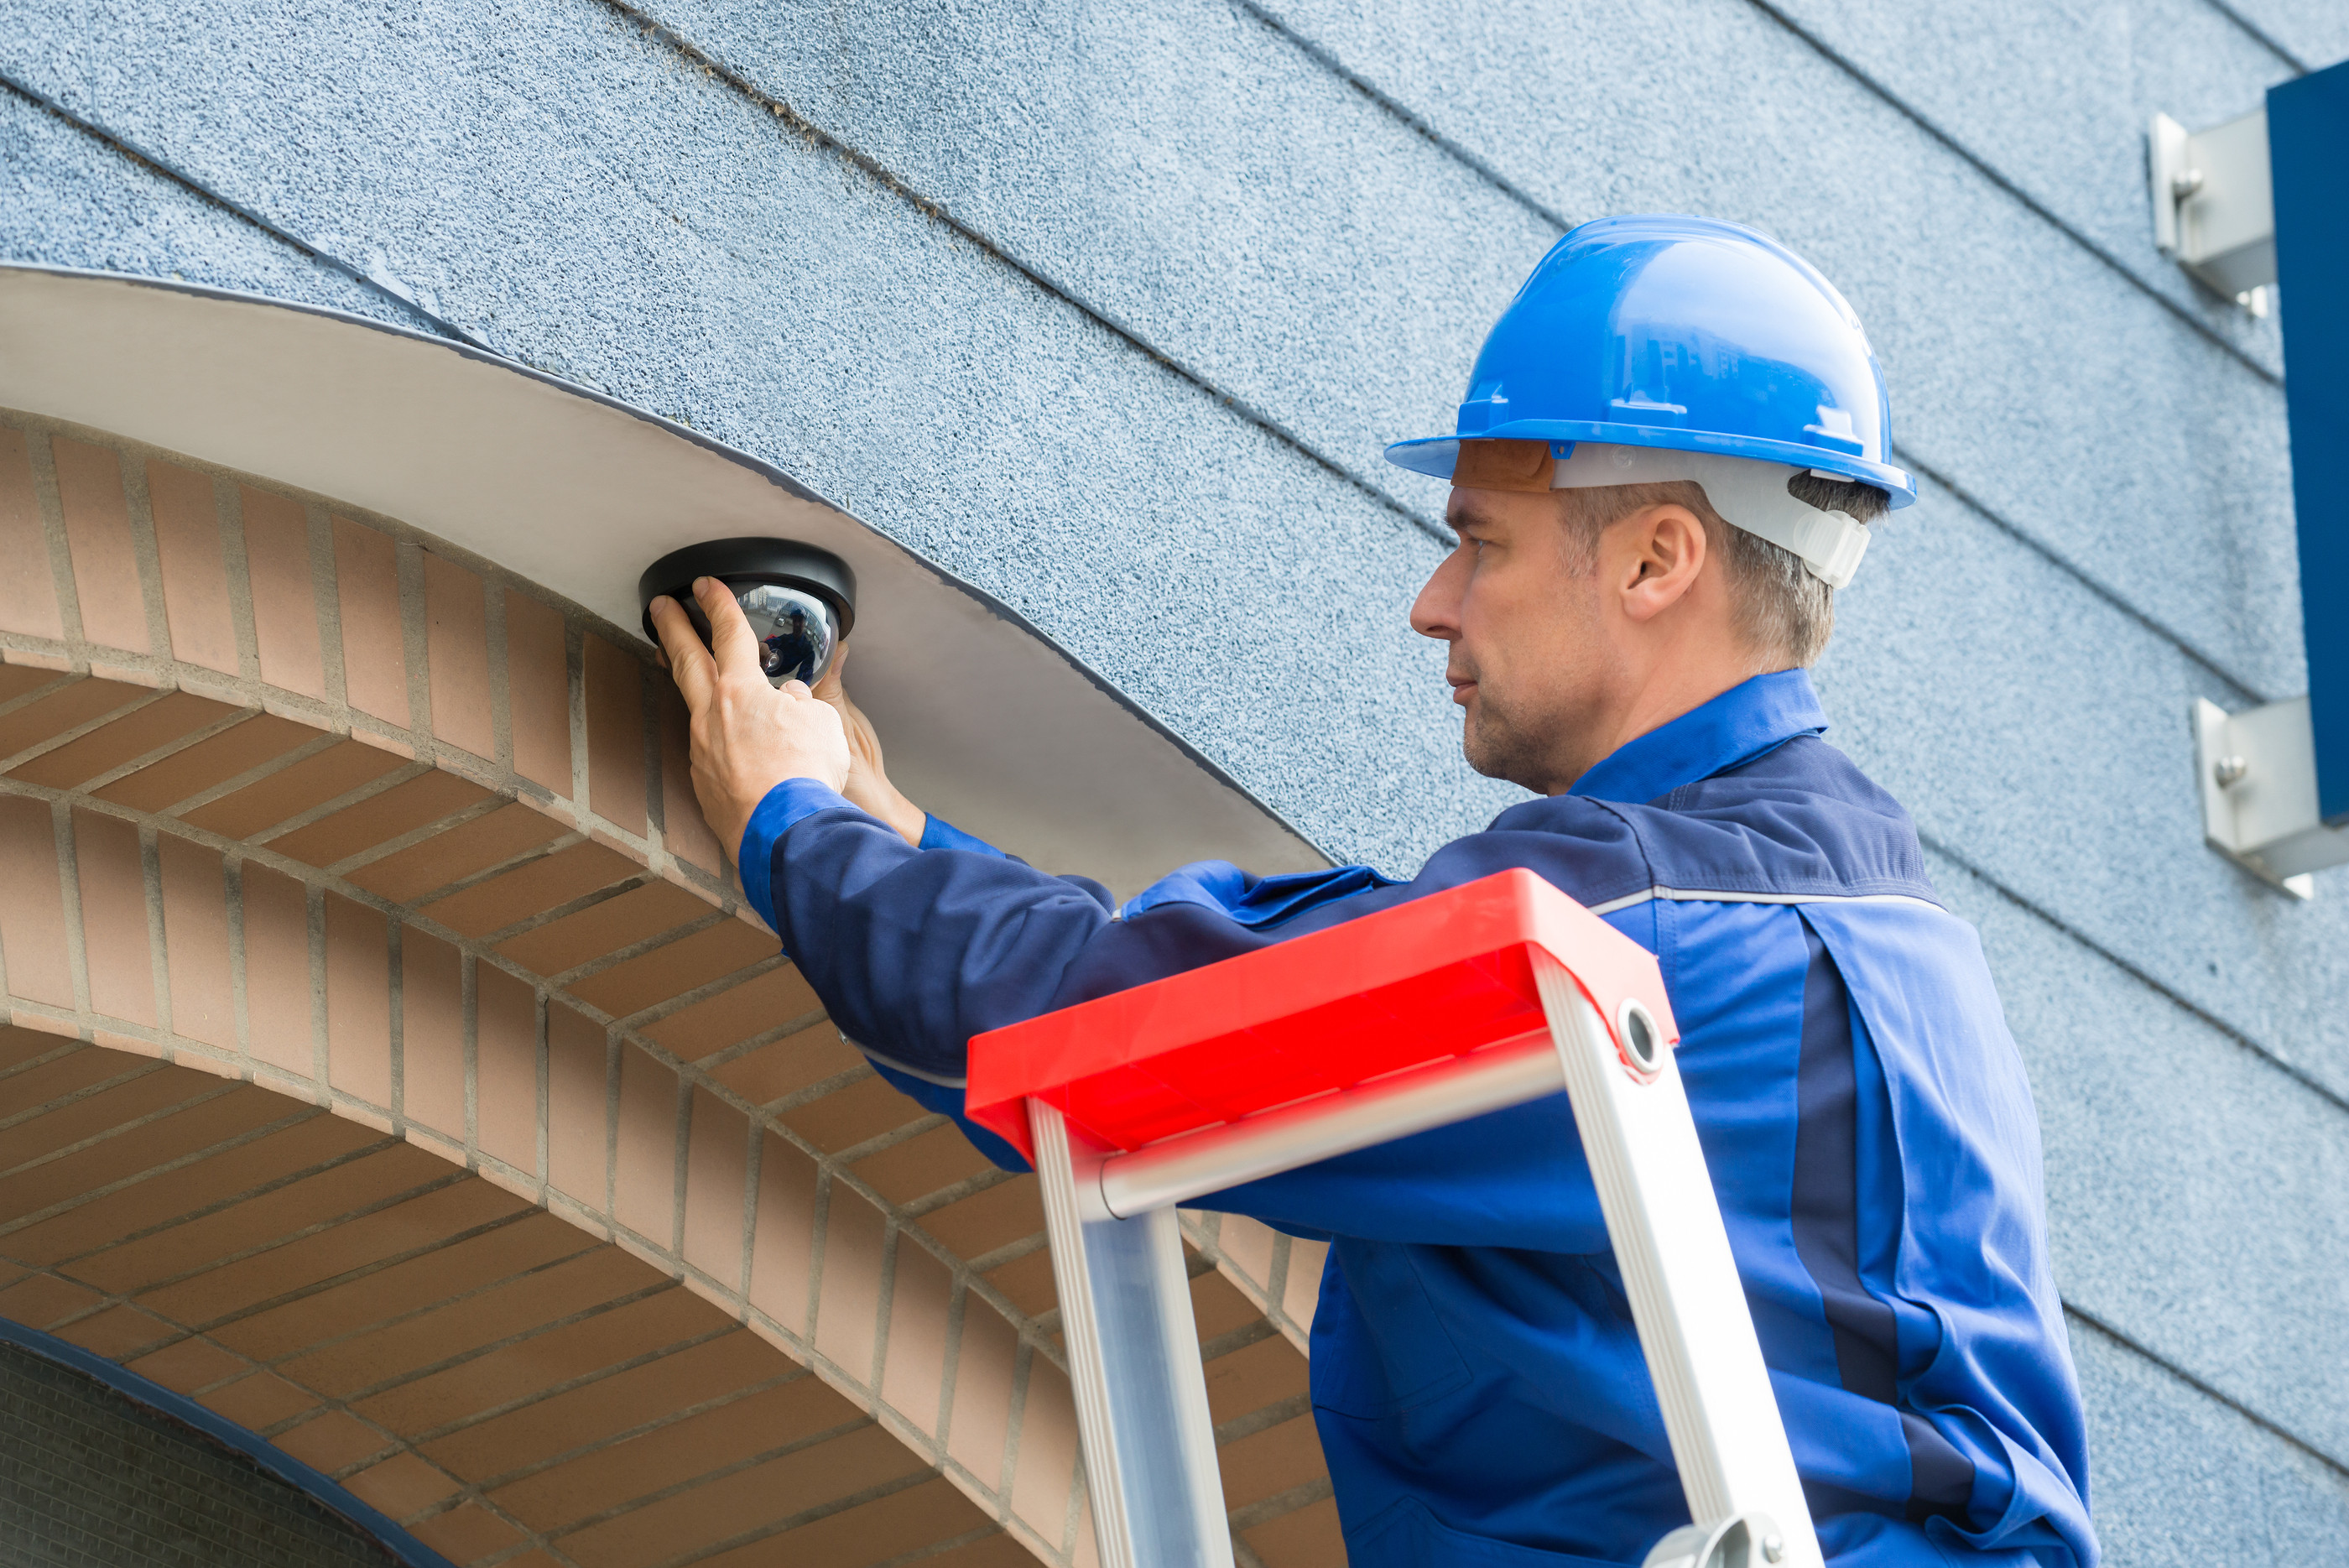 Security, CCTV, Access Control